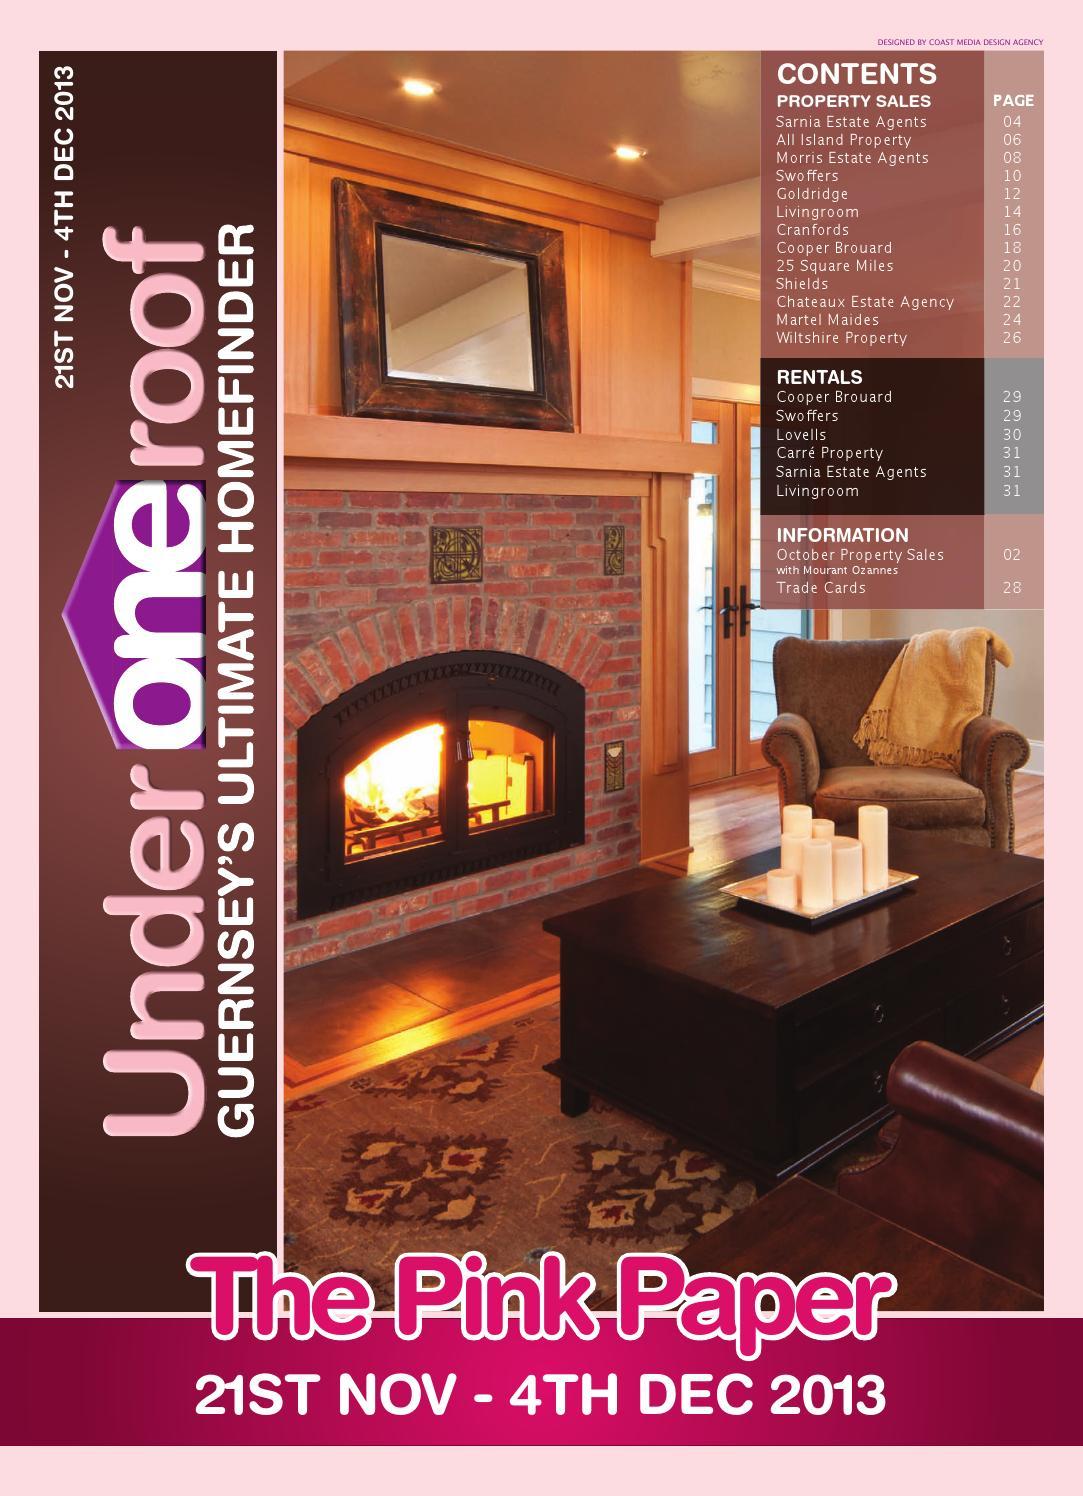 UnderOneRoof 21st November 2013 Issue By Coast Media